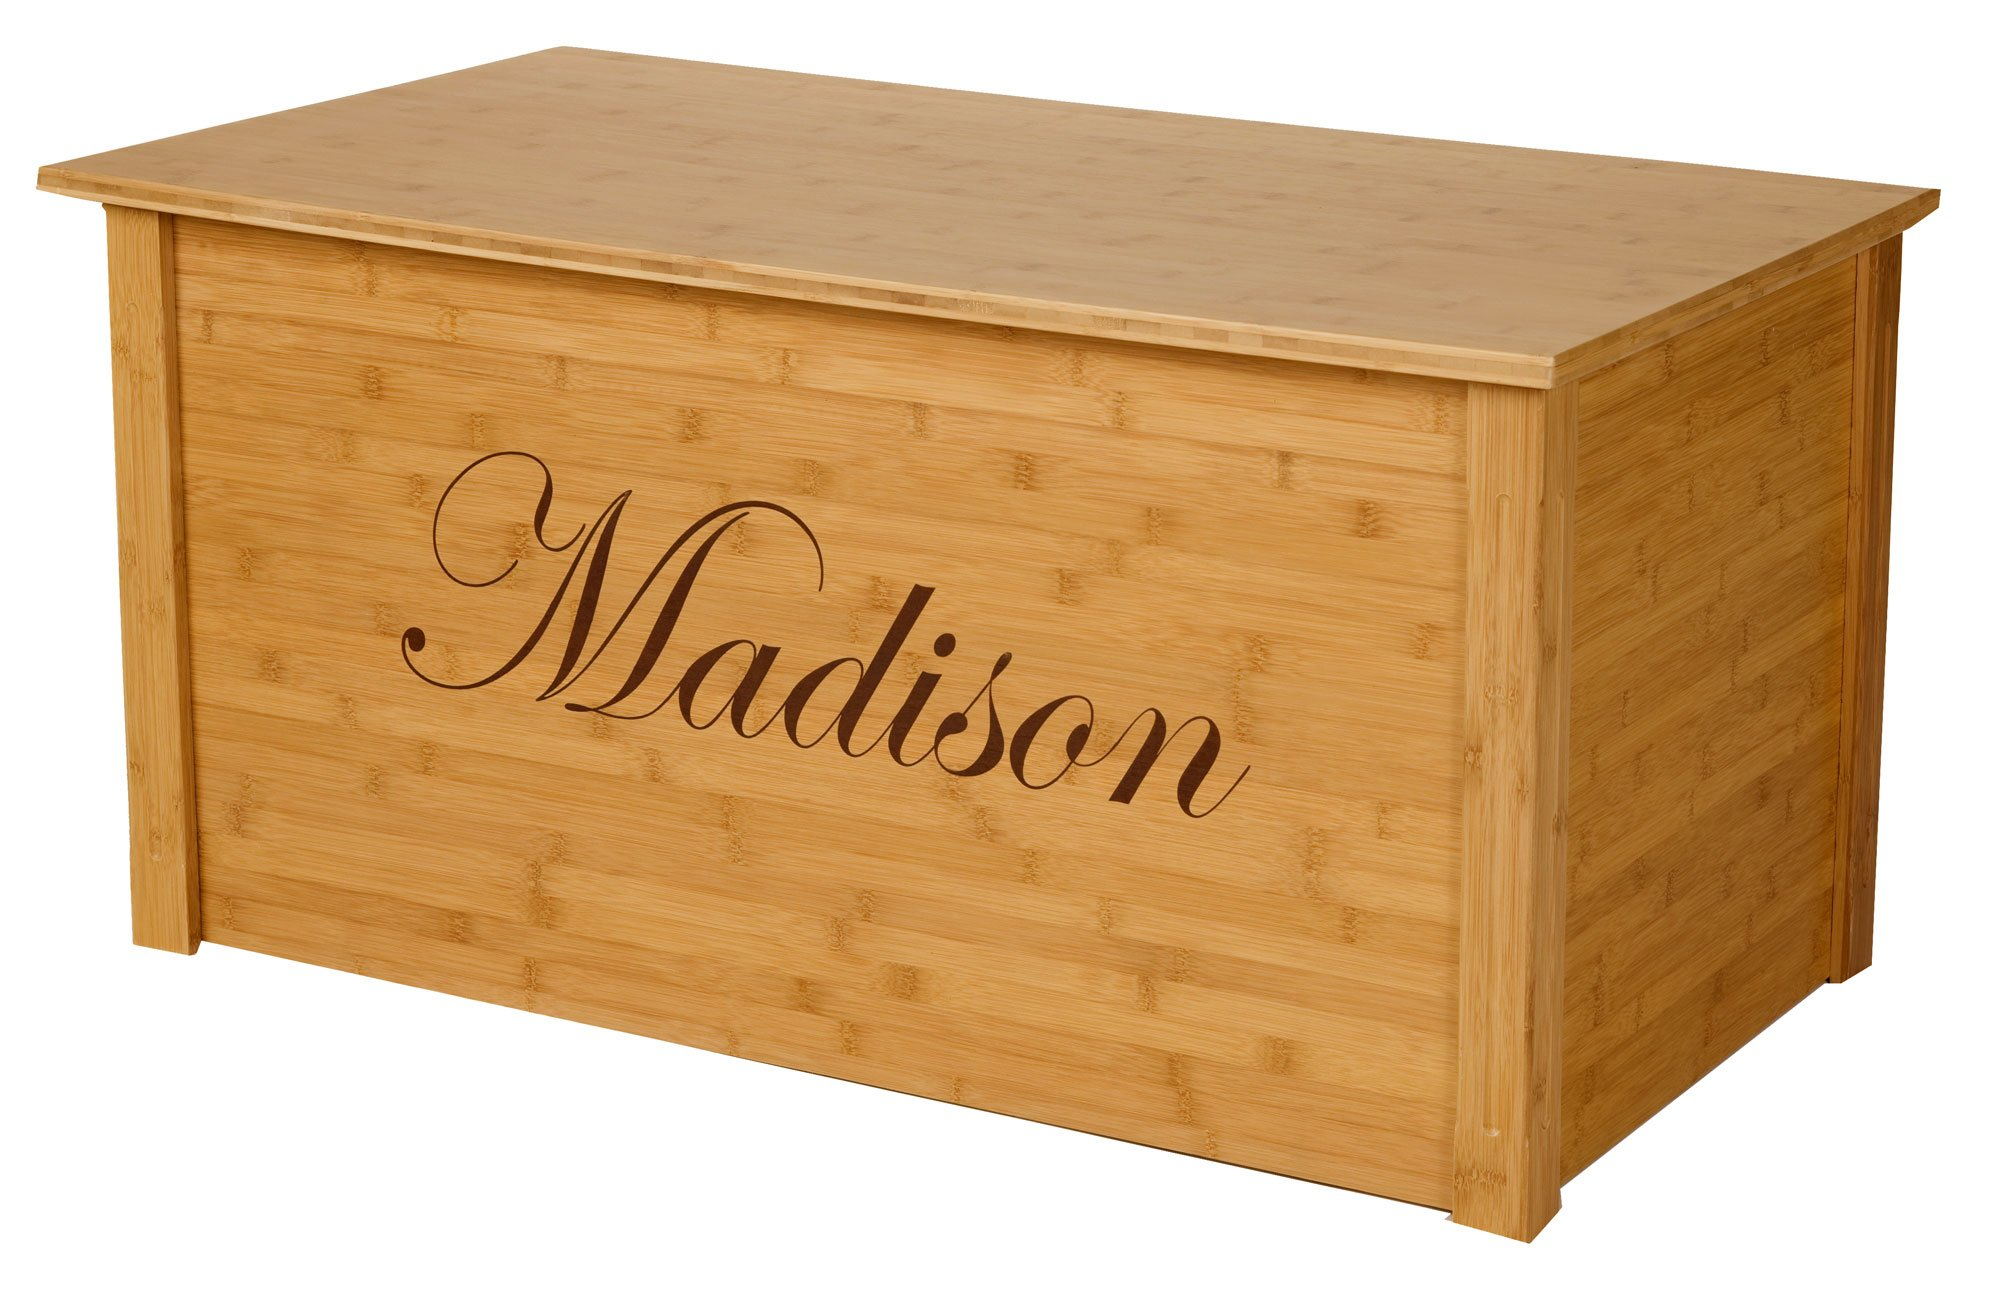 Wood Toy Box, Large Bamboo Toy Chest, Personalized Edwardian Font, Custom Options (Cedar Base)